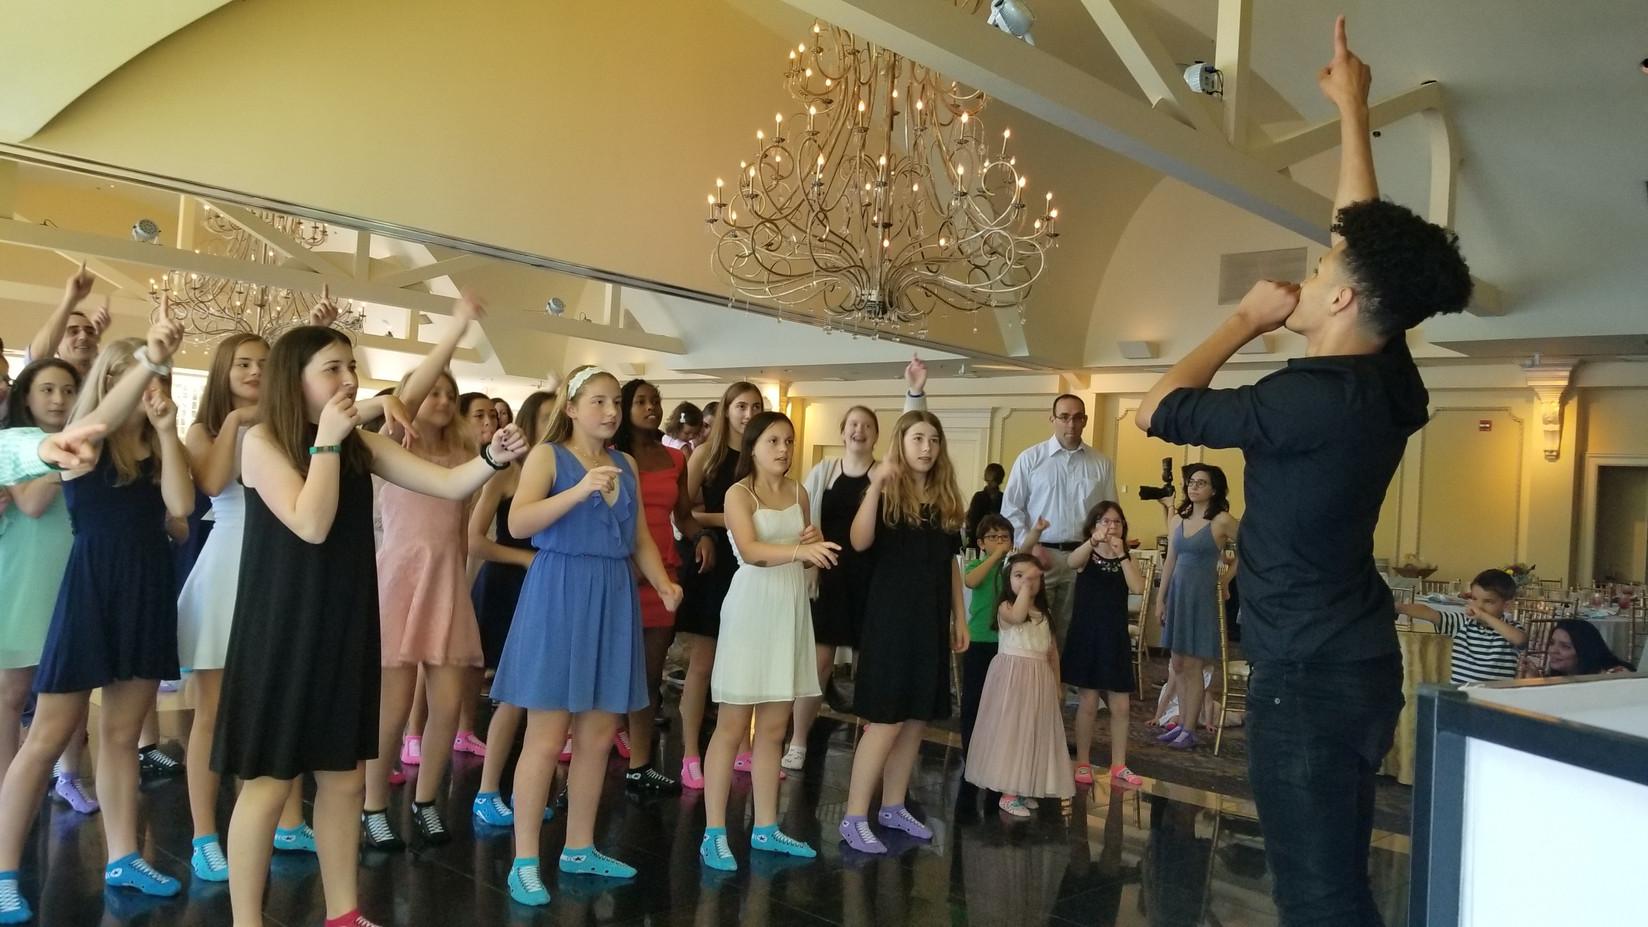 Motivationa-Lead-Dancer-For-Teen-Event.jpg